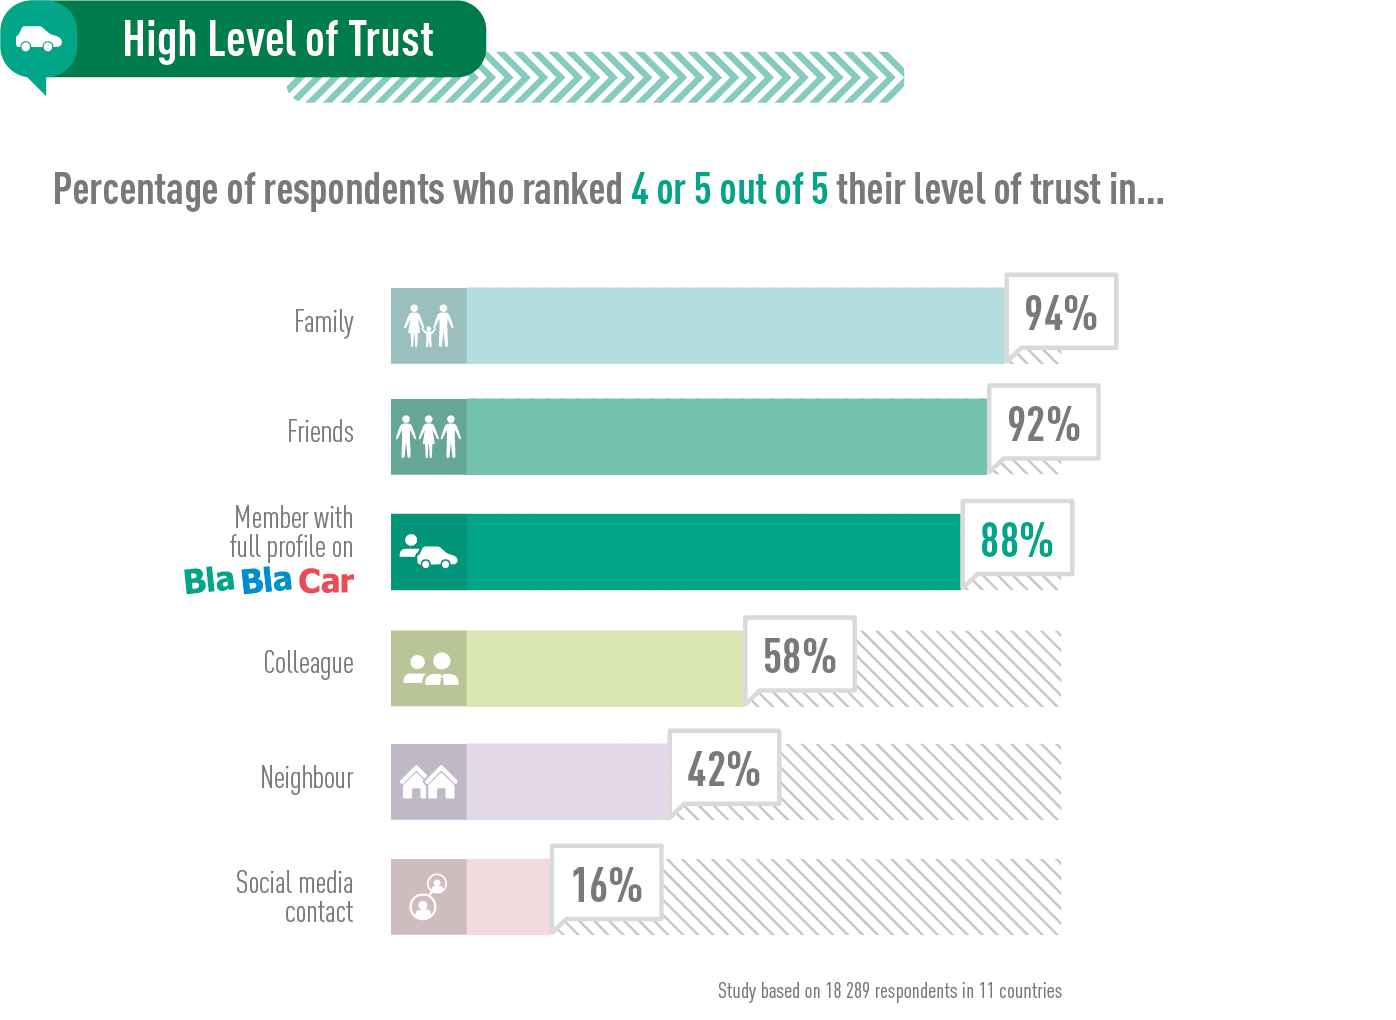 High level of trust